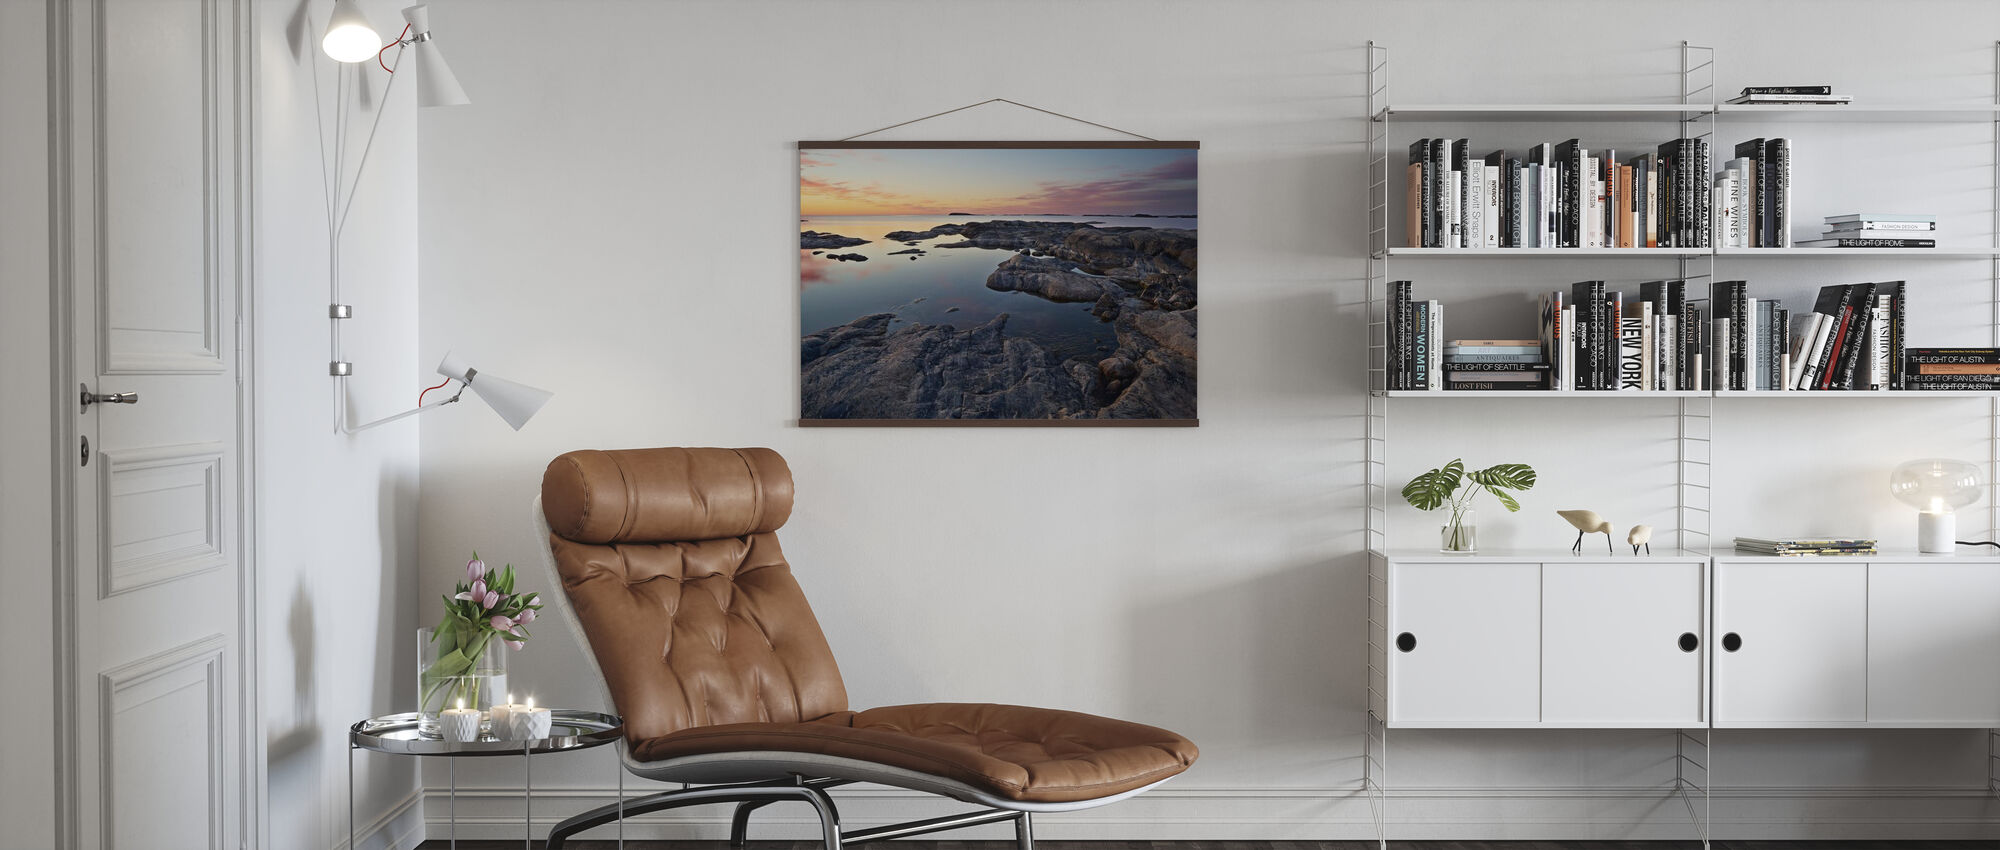 Idyllic Stockholm Archipelago - Poster - Living Room